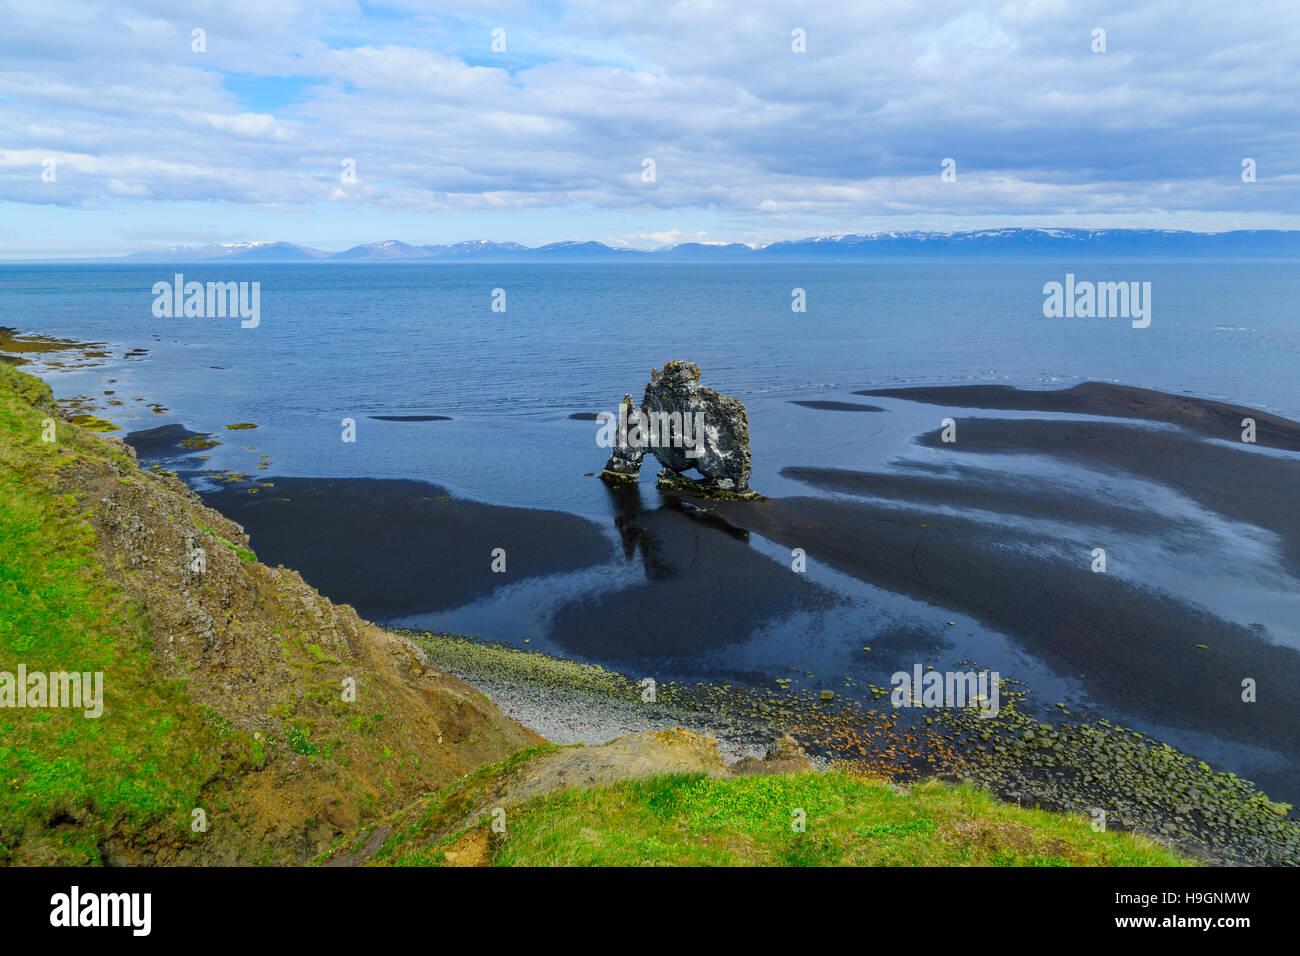 View of the Hvitserkur basalt stack, on the eastern shore of the Vatnsnes peninsula, northwest Iceland Stock Photo